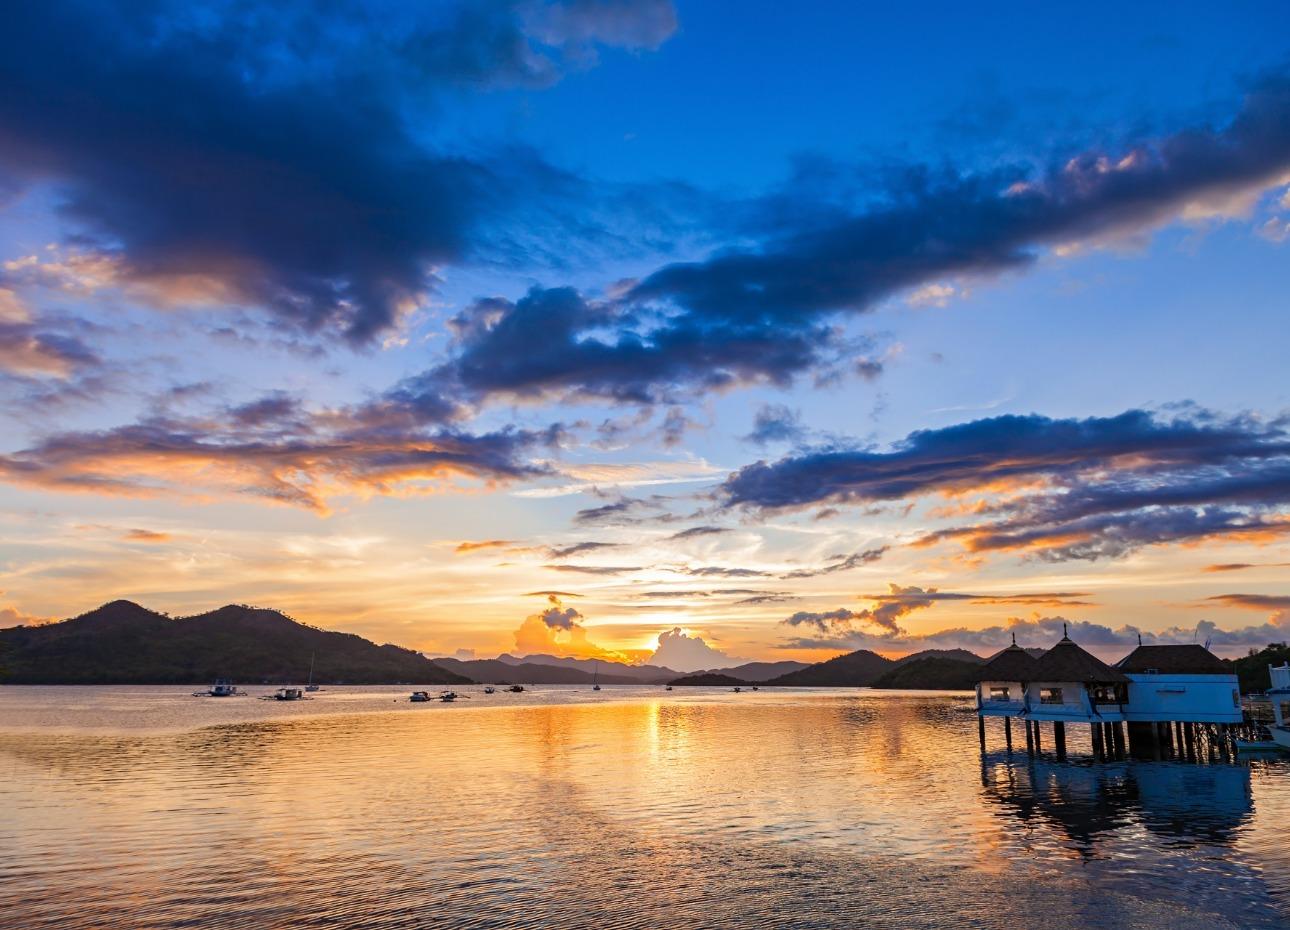 Philippines, Resort, Sunset, image,